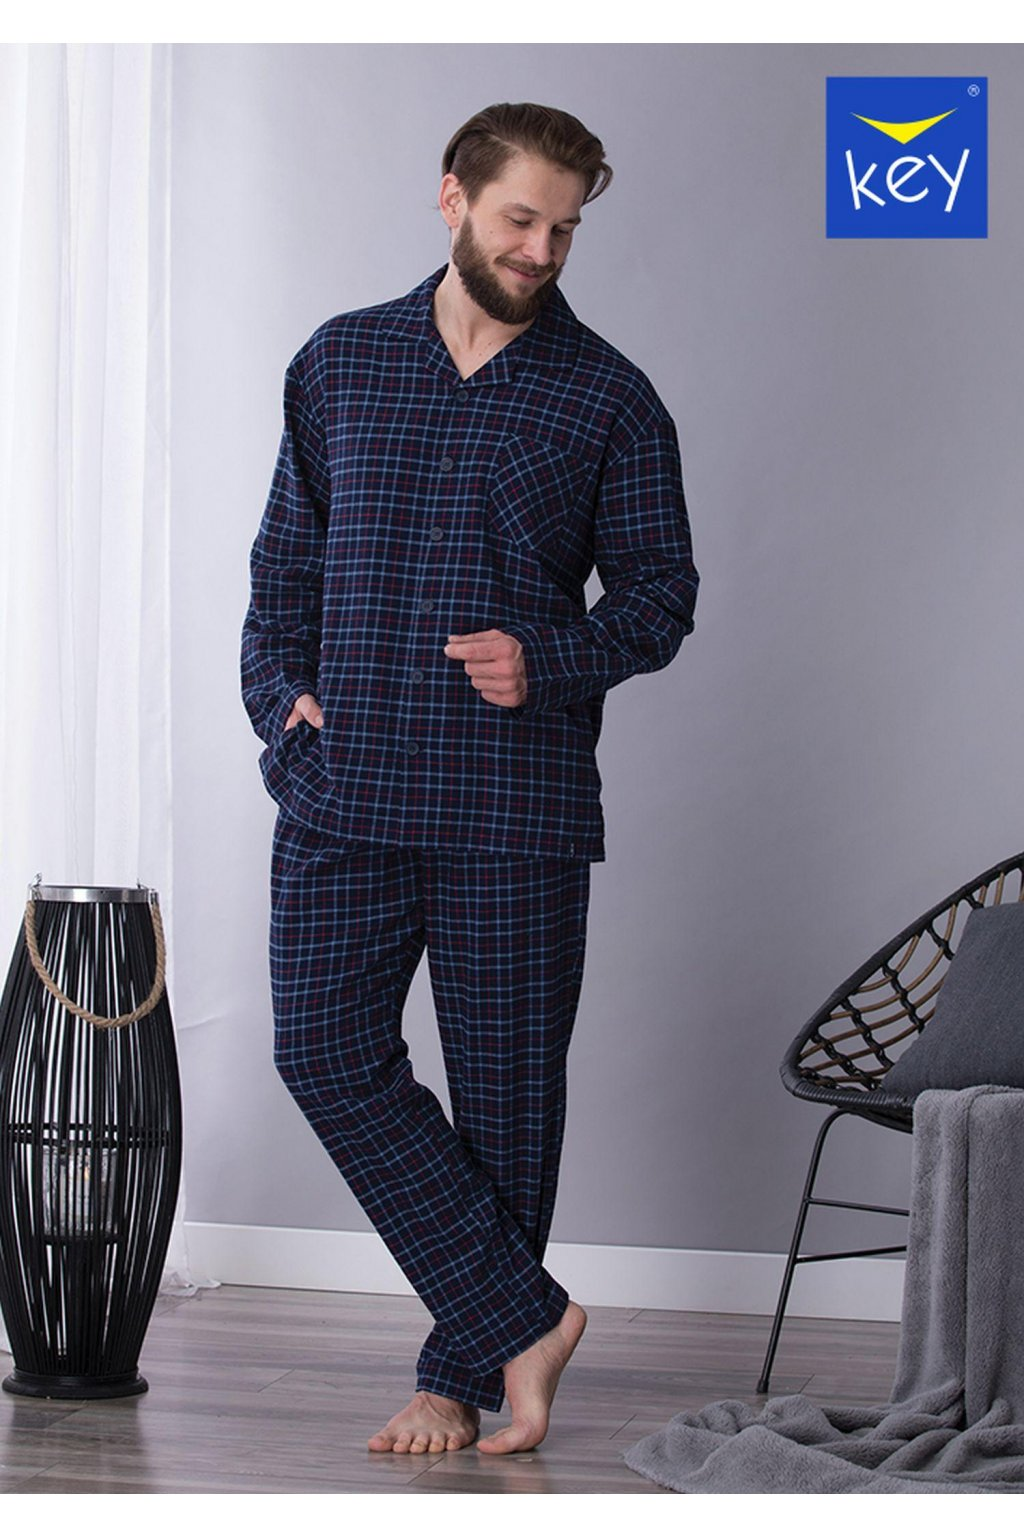 Pánské flanelové kárované pyžamo MNS 458 KEY